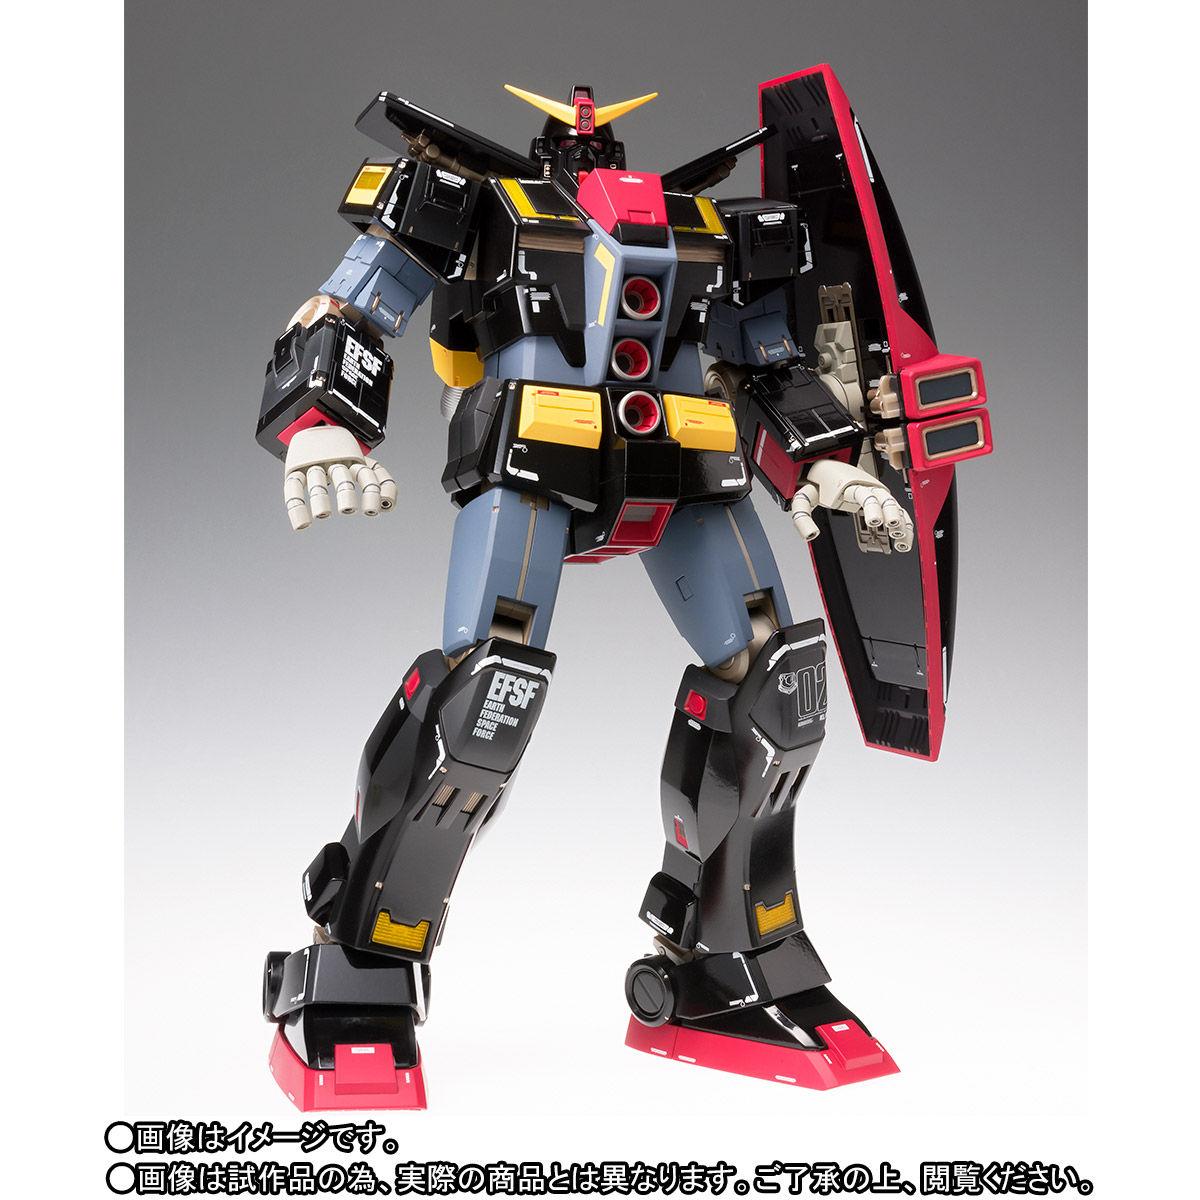 FIX FIGURATION METAL COMPOSITE『サイコ・ガンダム(グロスカラーVer.)』機動戦士Zガンダム アクションフィギュア-003